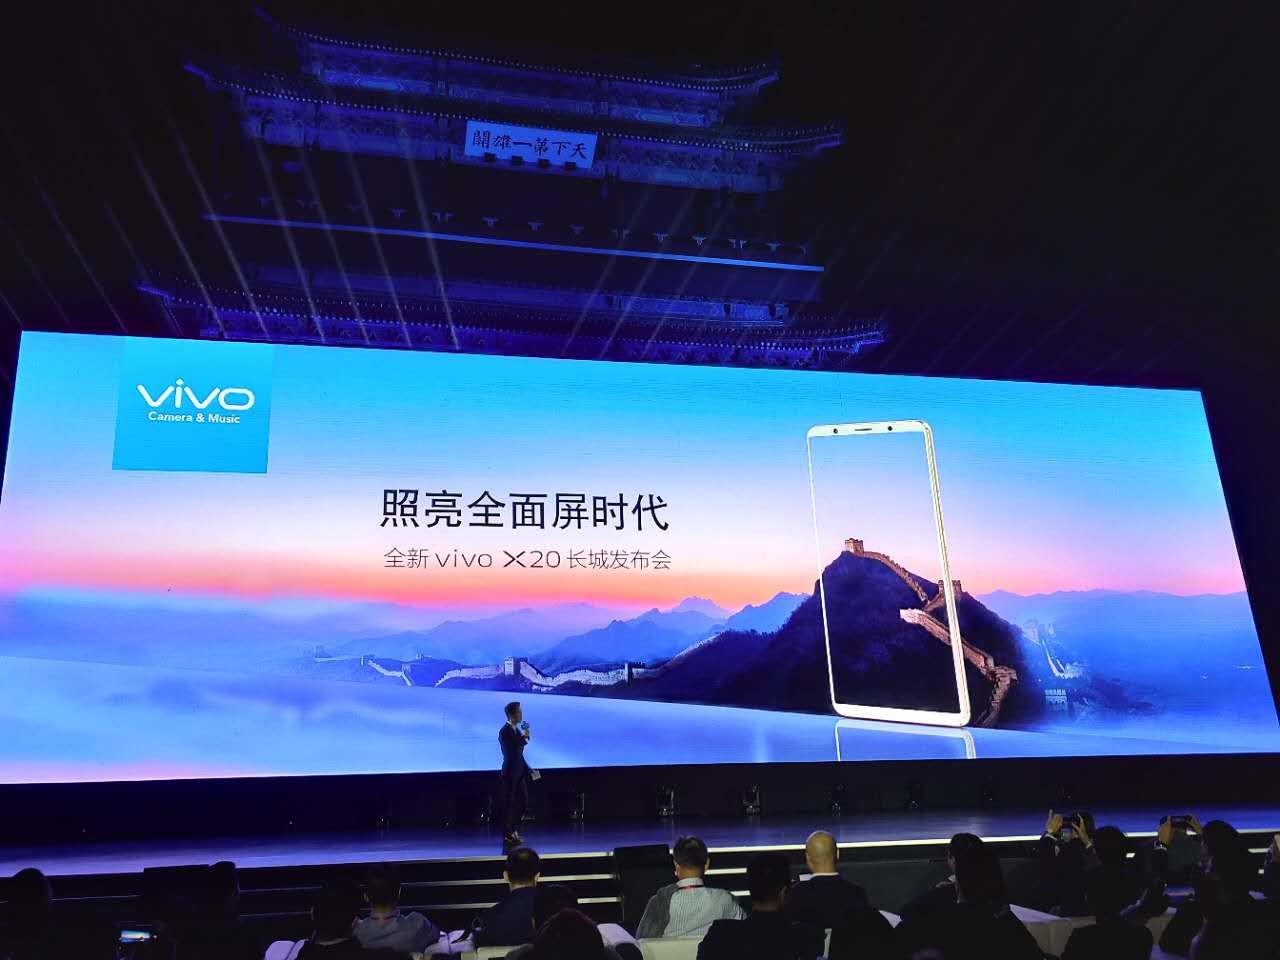 vivo X20新品发布 全面屏+面部识别 起售价2998元